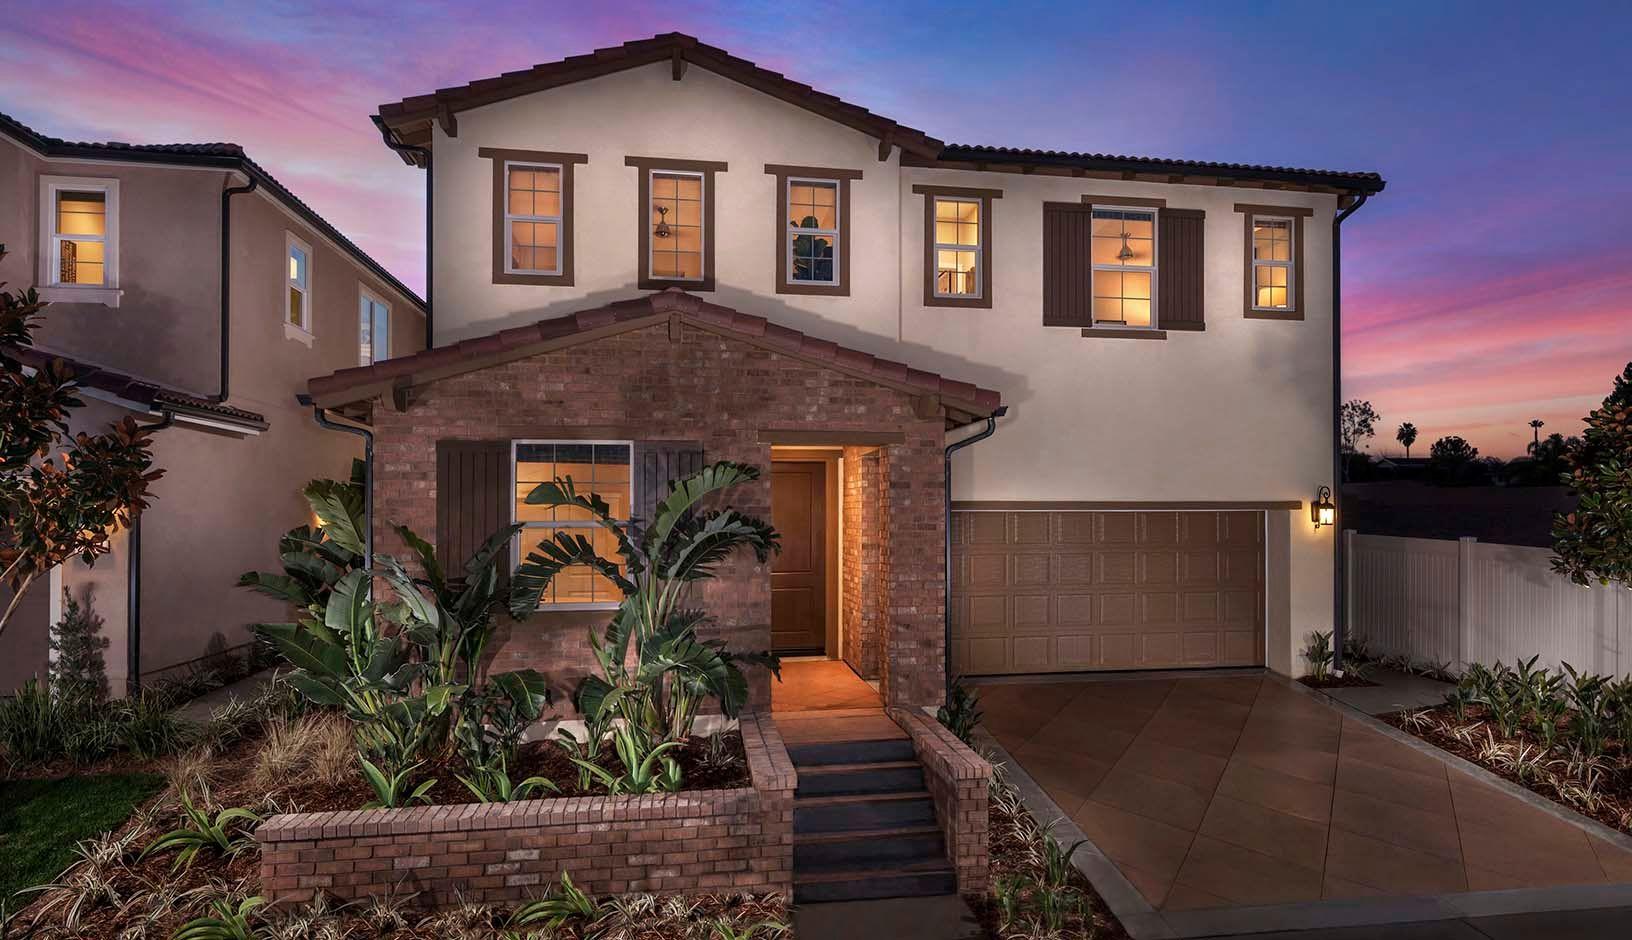 2830 Villa Catalonia Court, Corona, CA Homes & Land - Real Estate